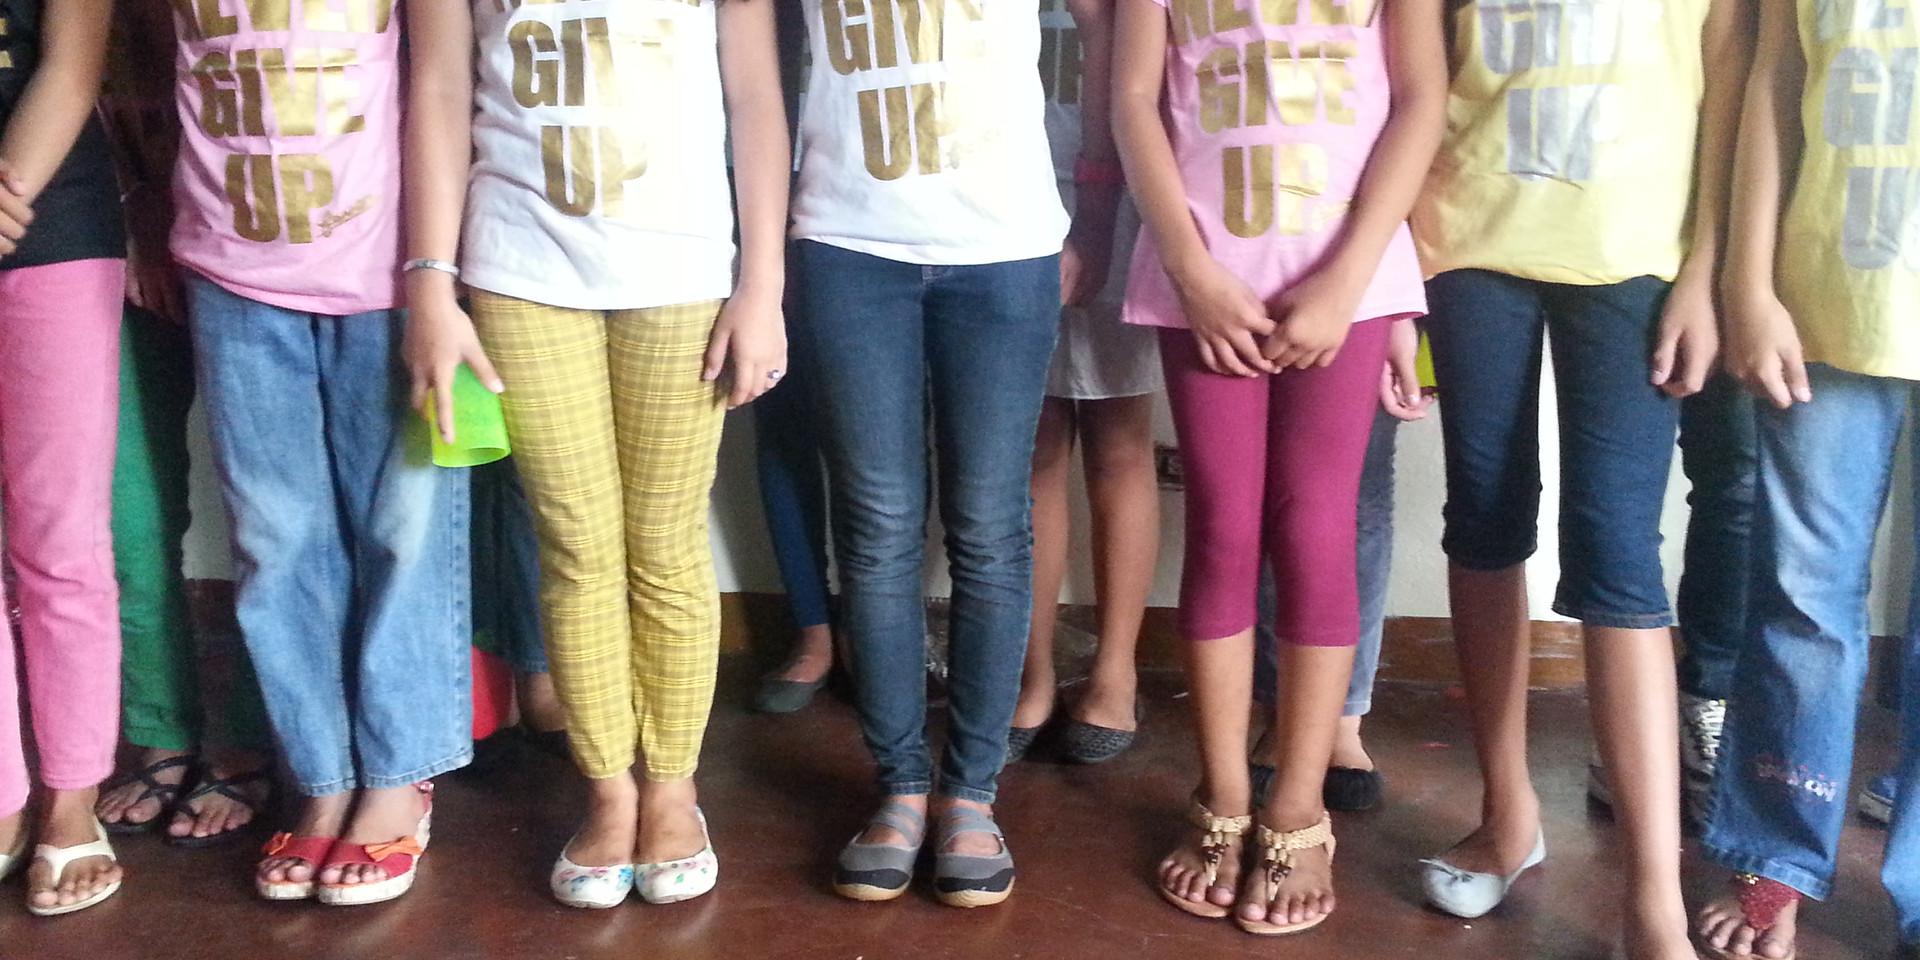 Children of the Outreach Program